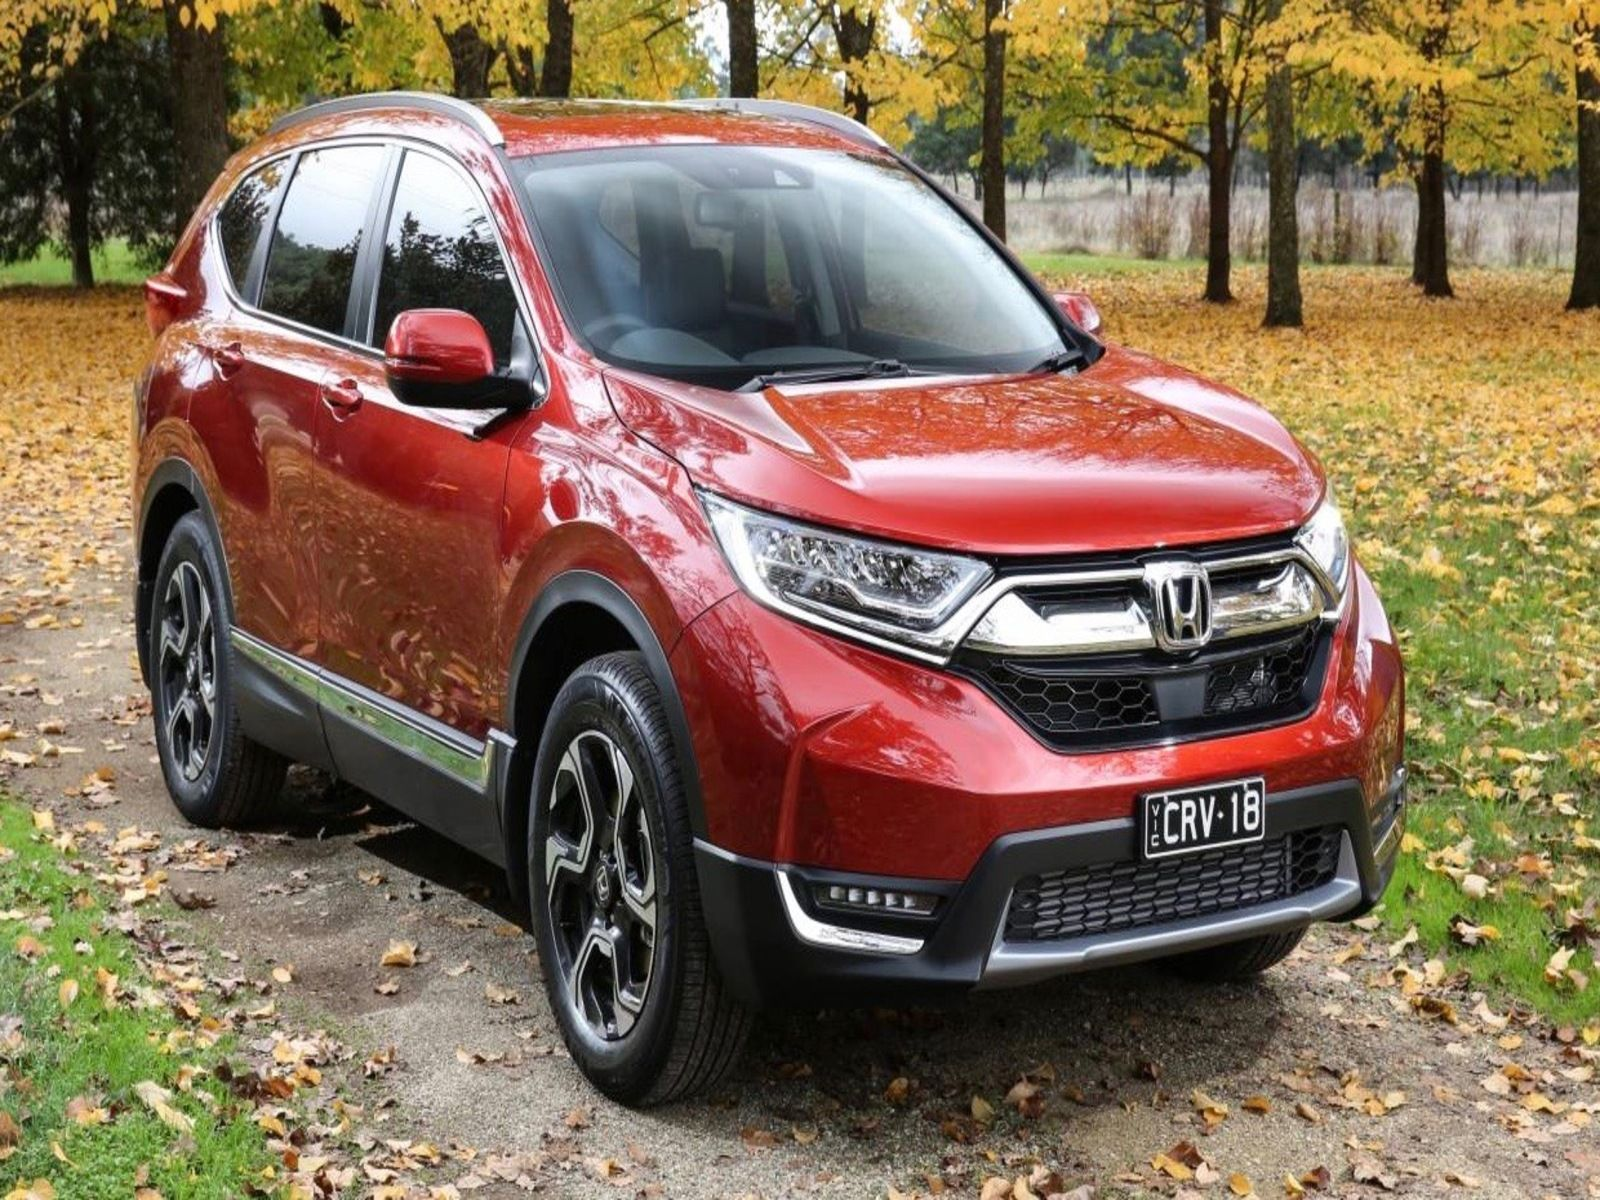 2017 Honda Cr V Specs Australia Honda Honda Cars Honda Cr Honda